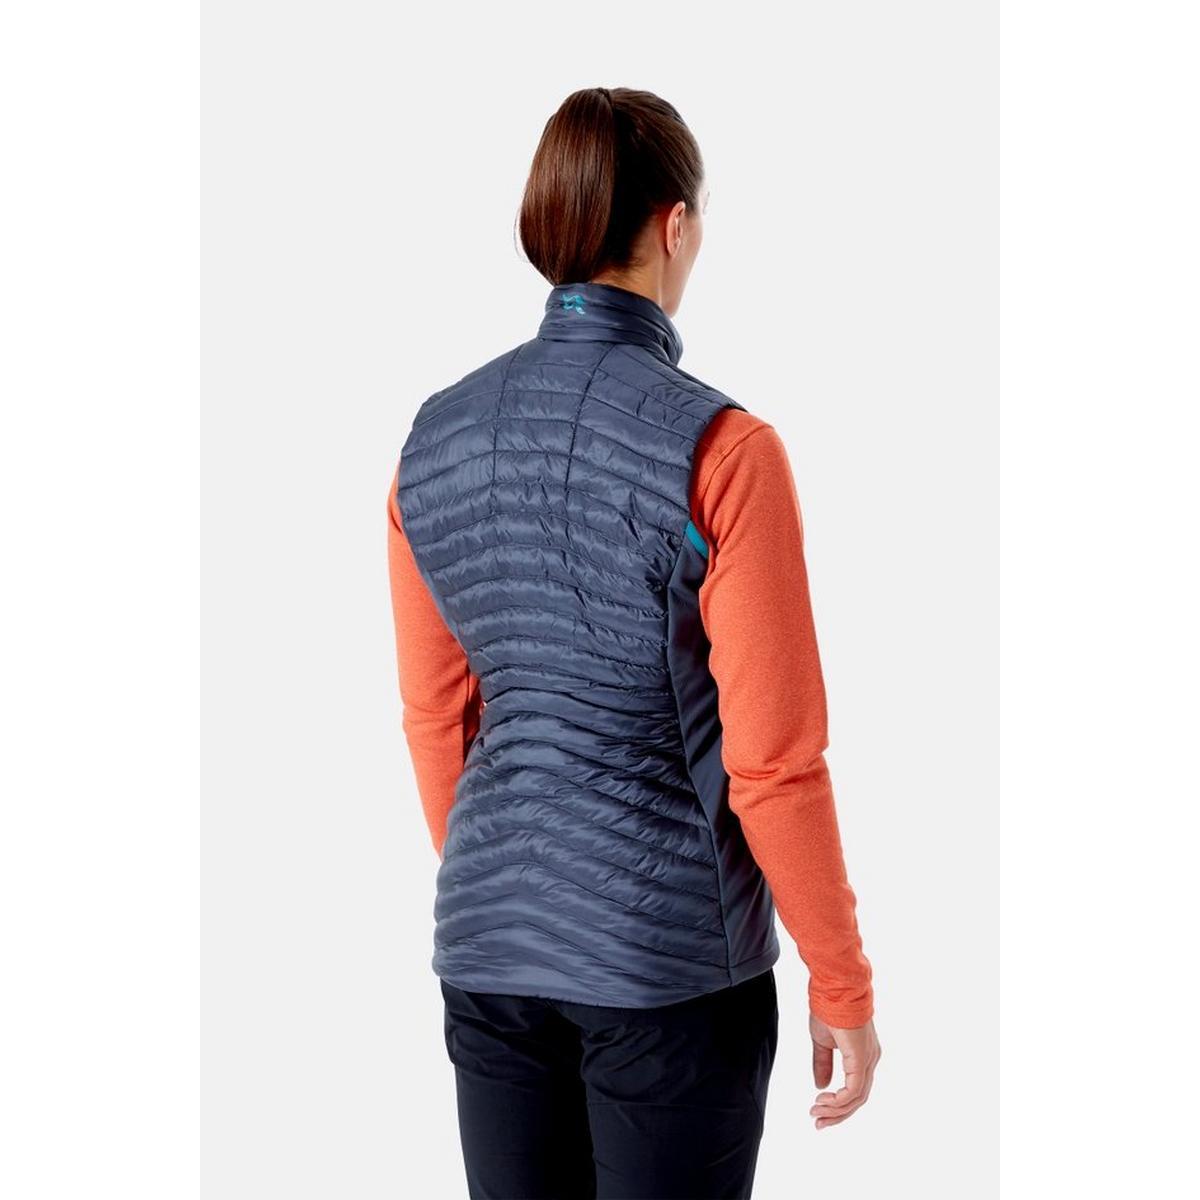 Rab Women's Cirrus Flex 2.0 Vest - Grey